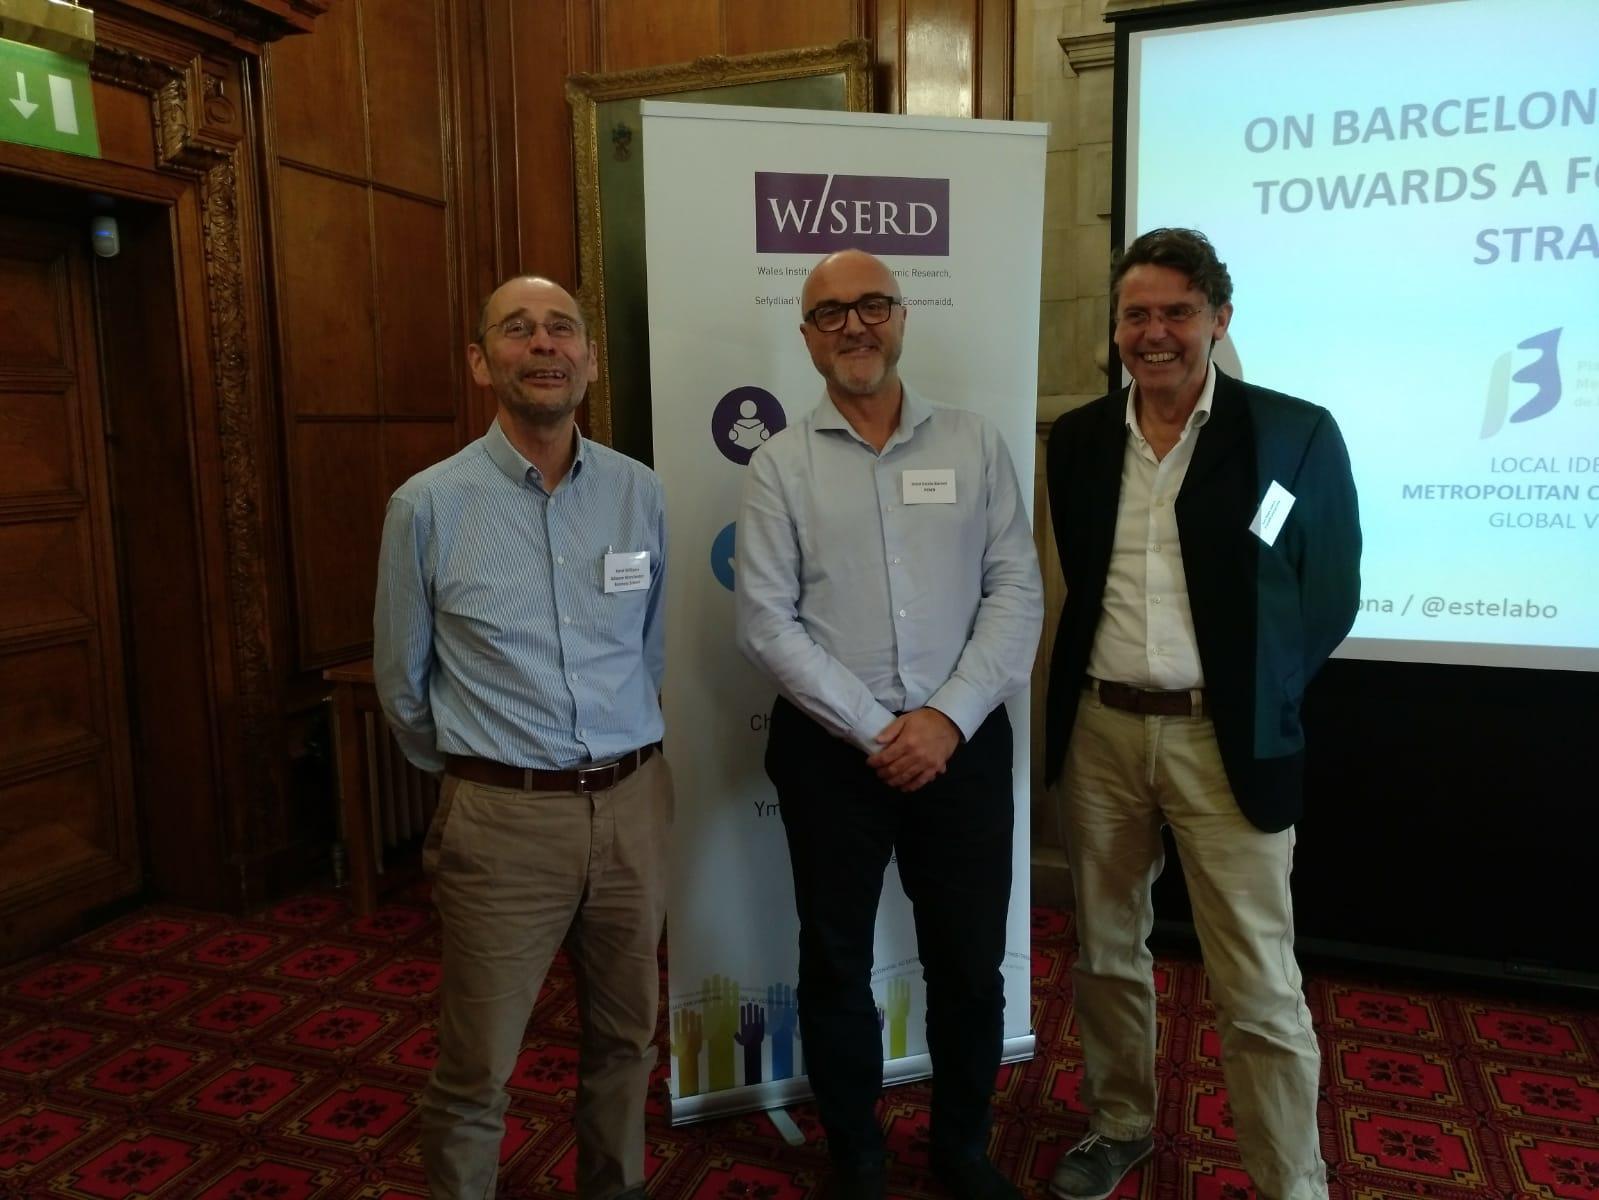 Oriol Estela durant el Congrés sobre Foundational Economy a Cardiff